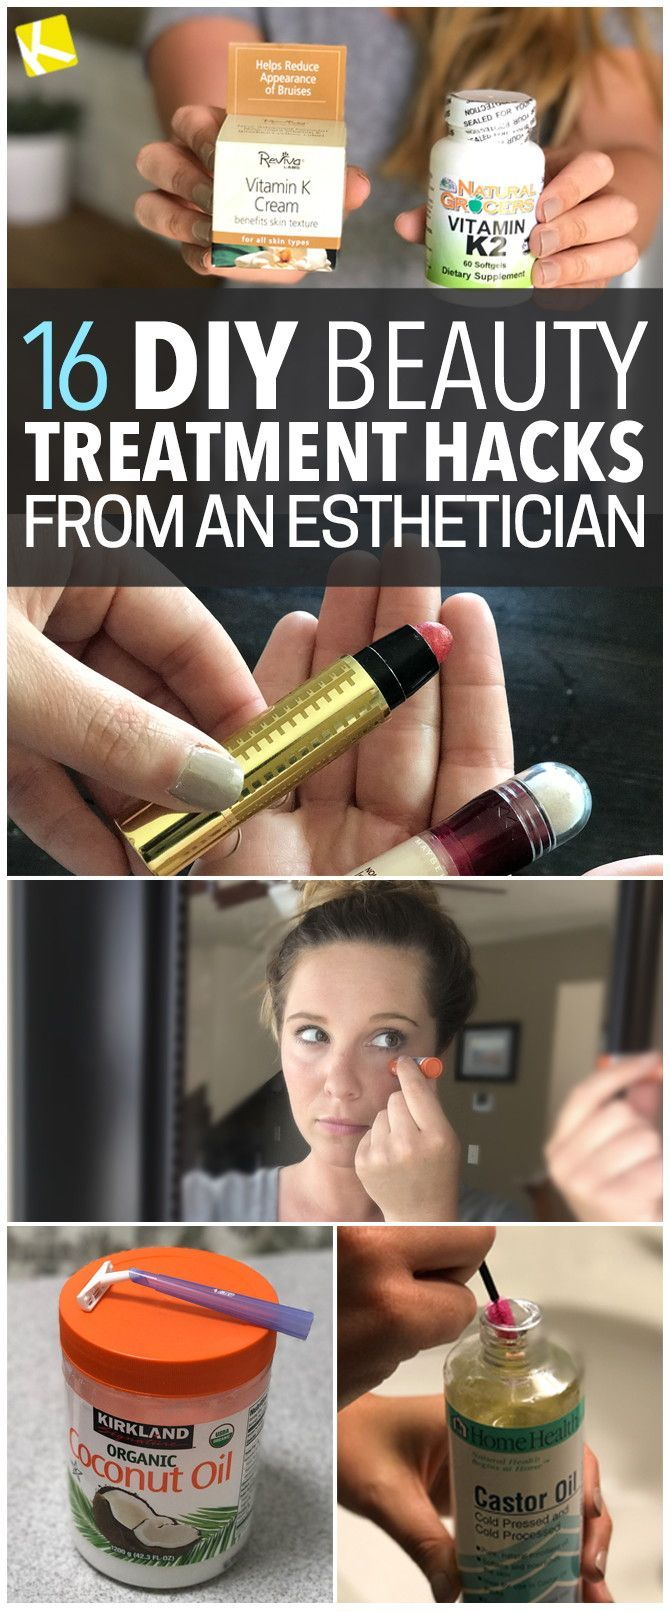 15 DIY Beauty Treatment Hacks from an Esthetician #beautytips